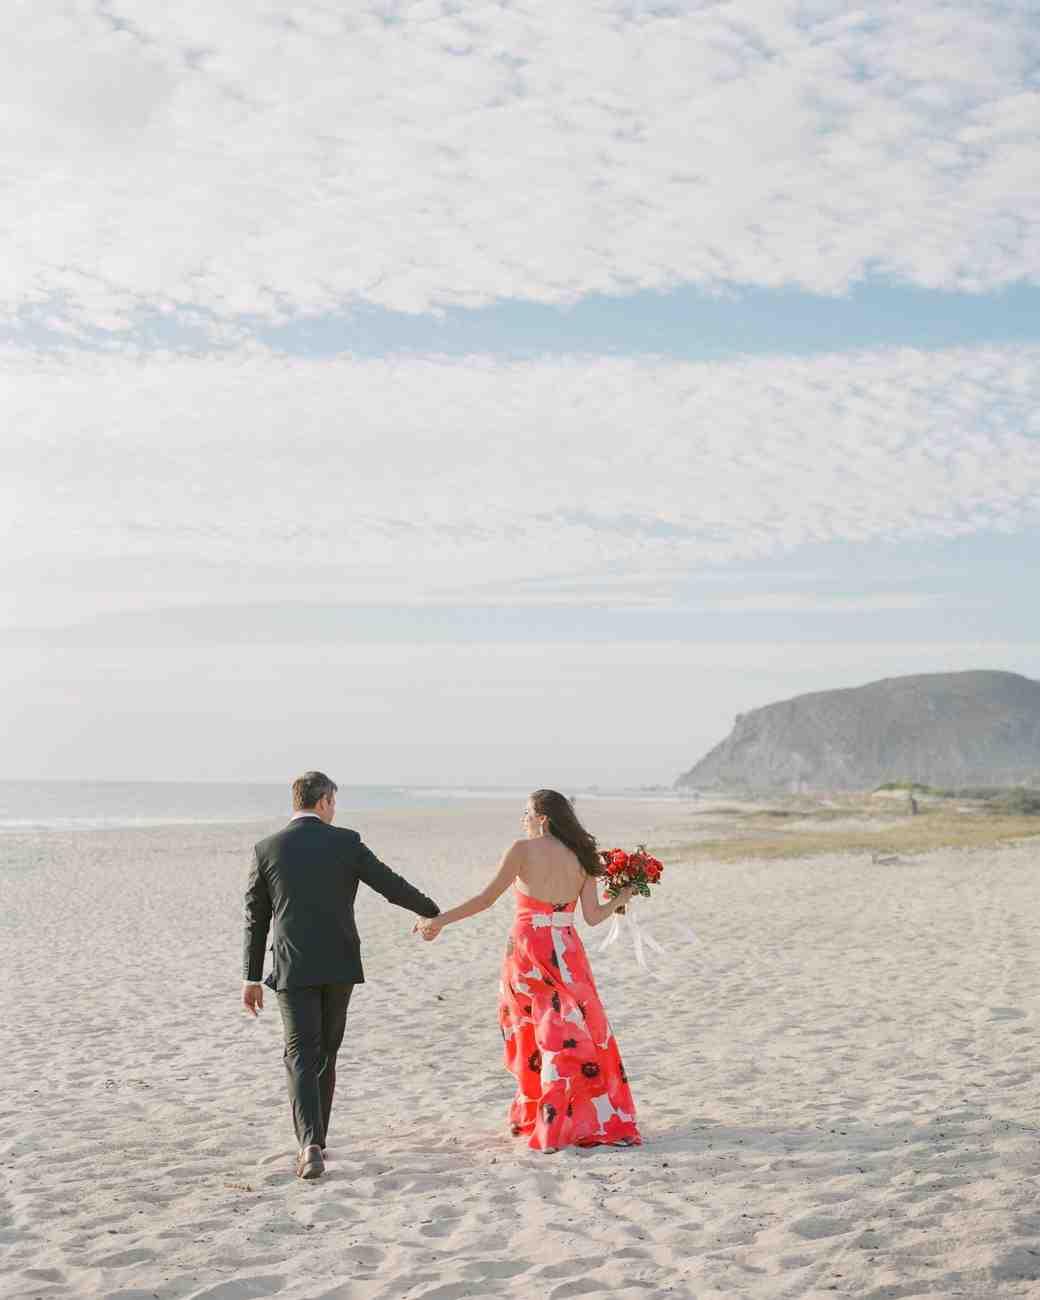 couple beach walking